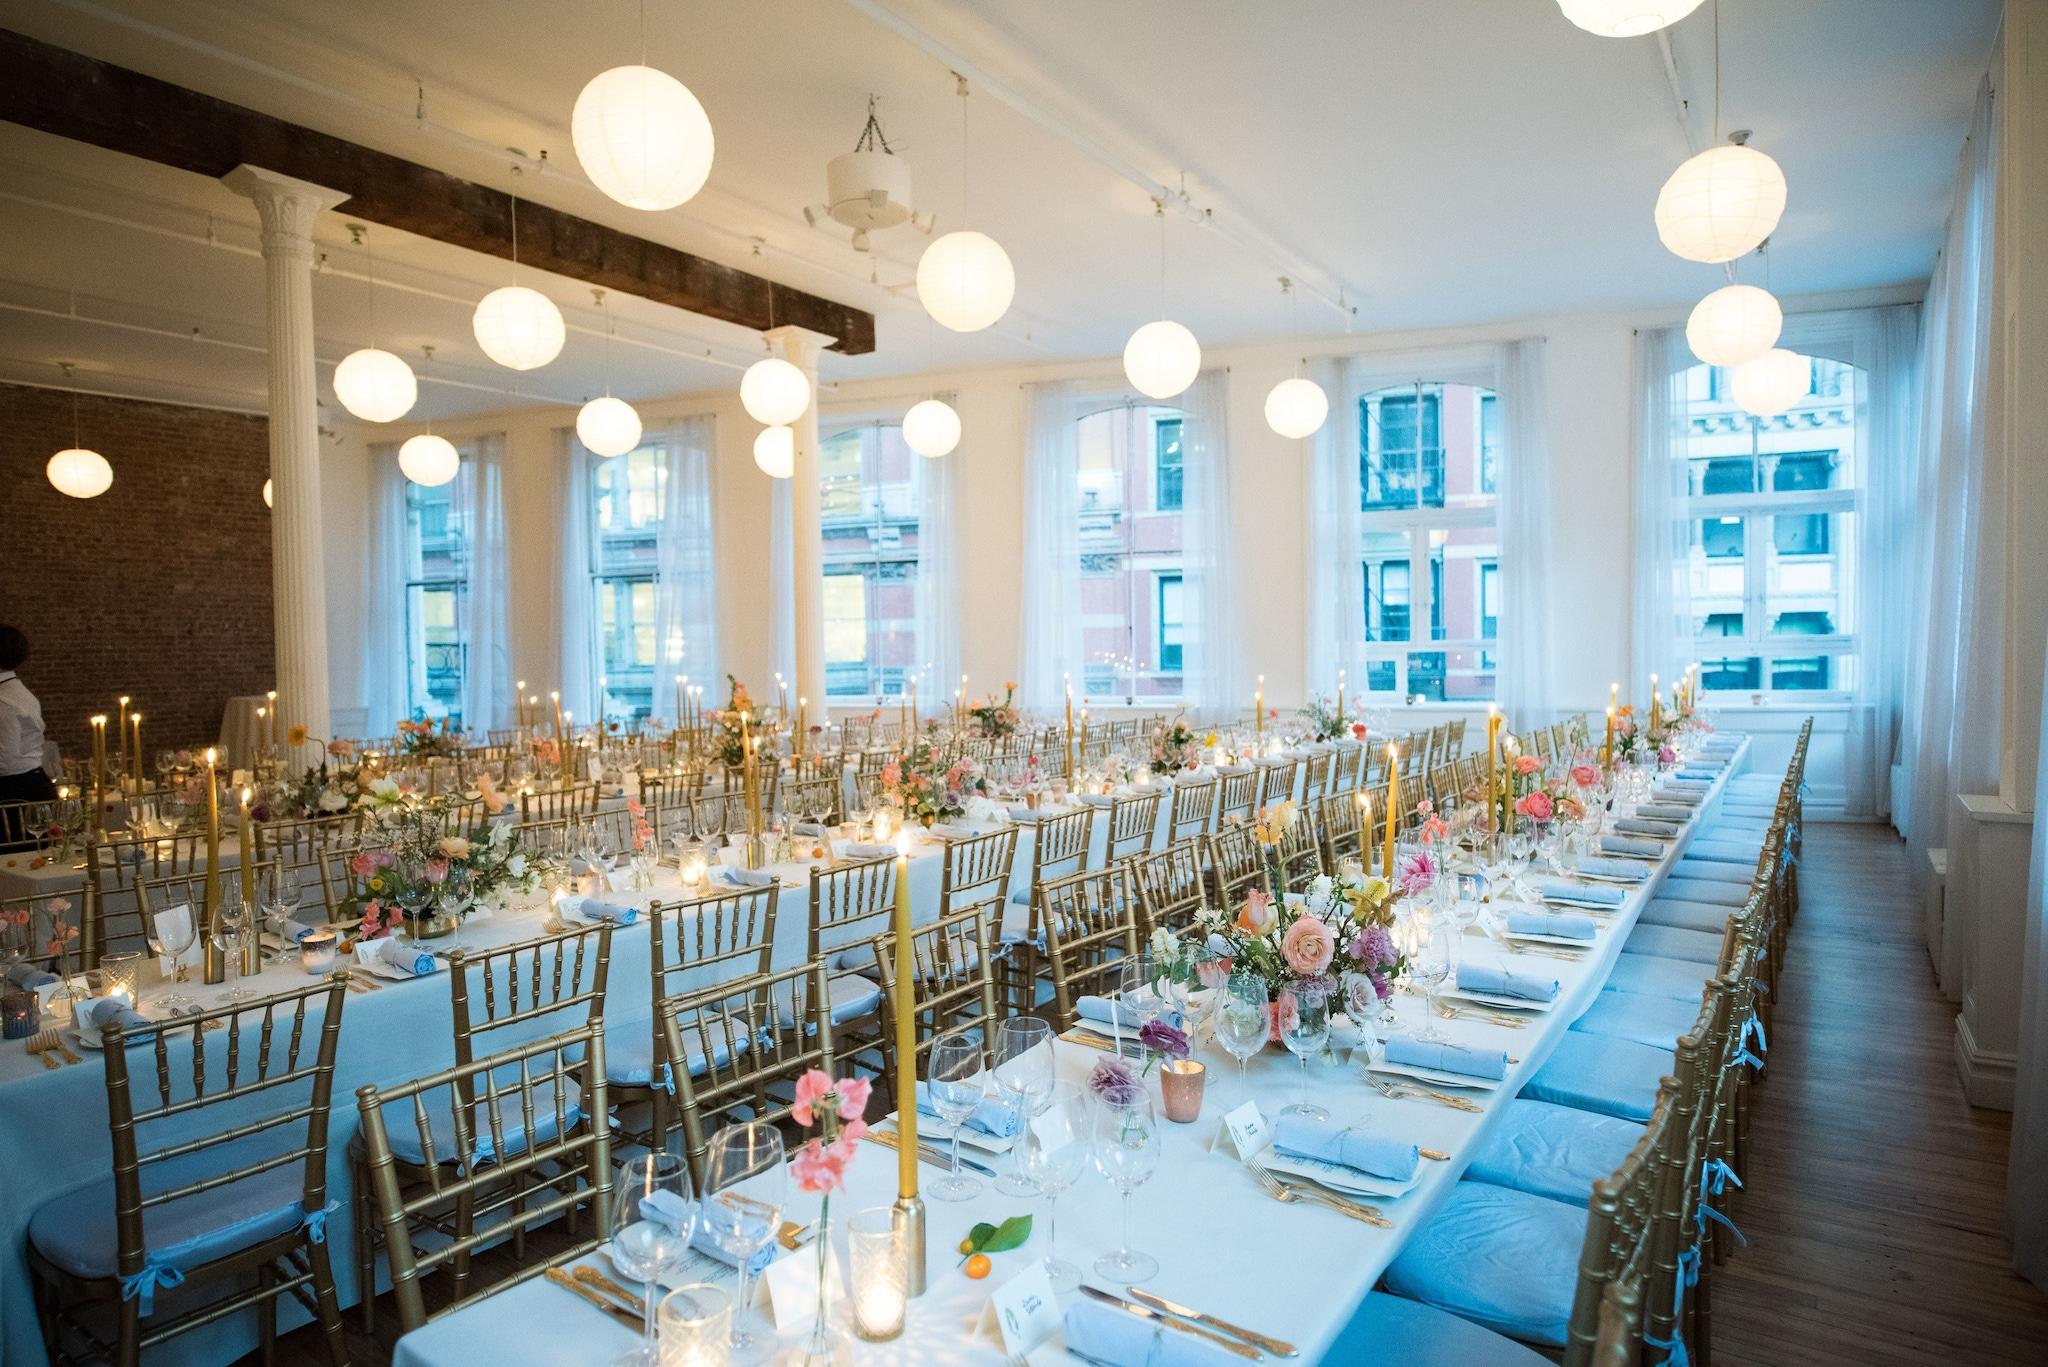 The Third Floor Loft at Taralucci e Vino Events NYC